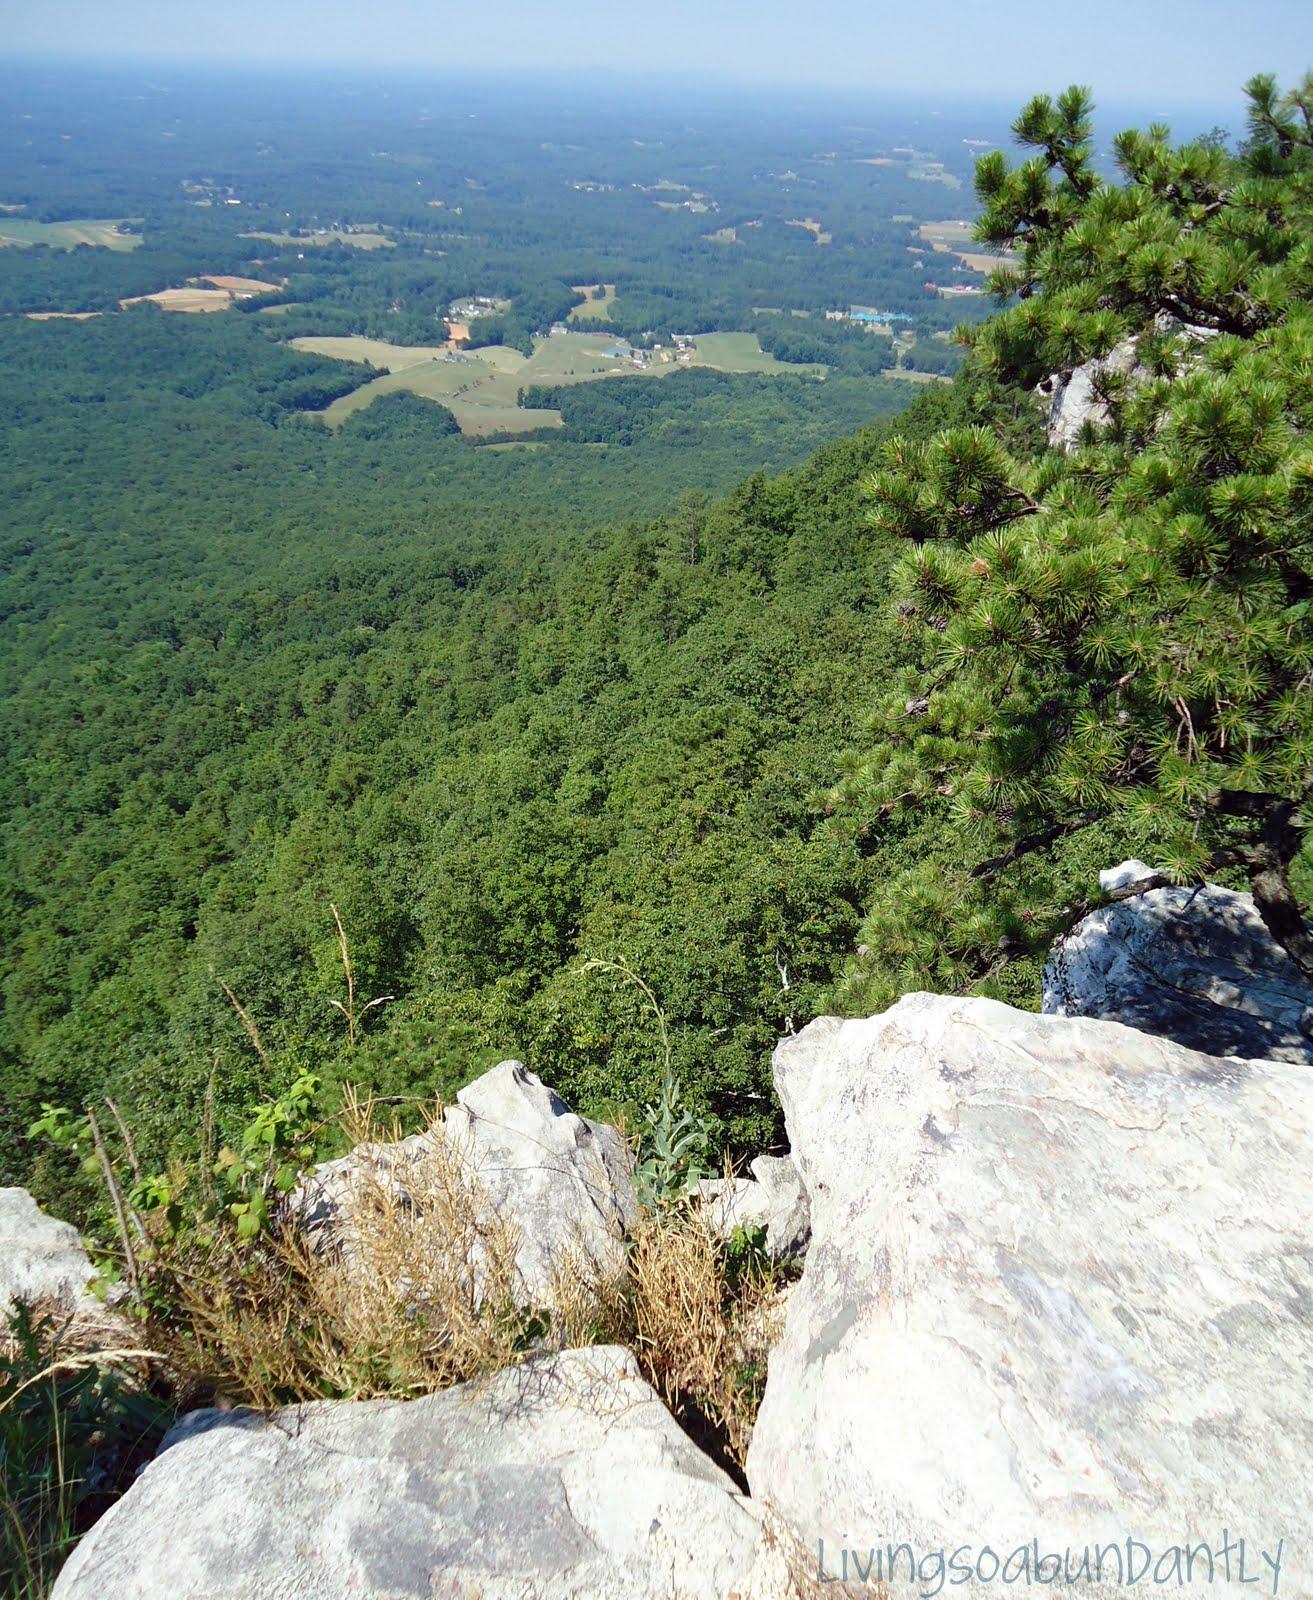 Pilot Mountain Living So Abundantly